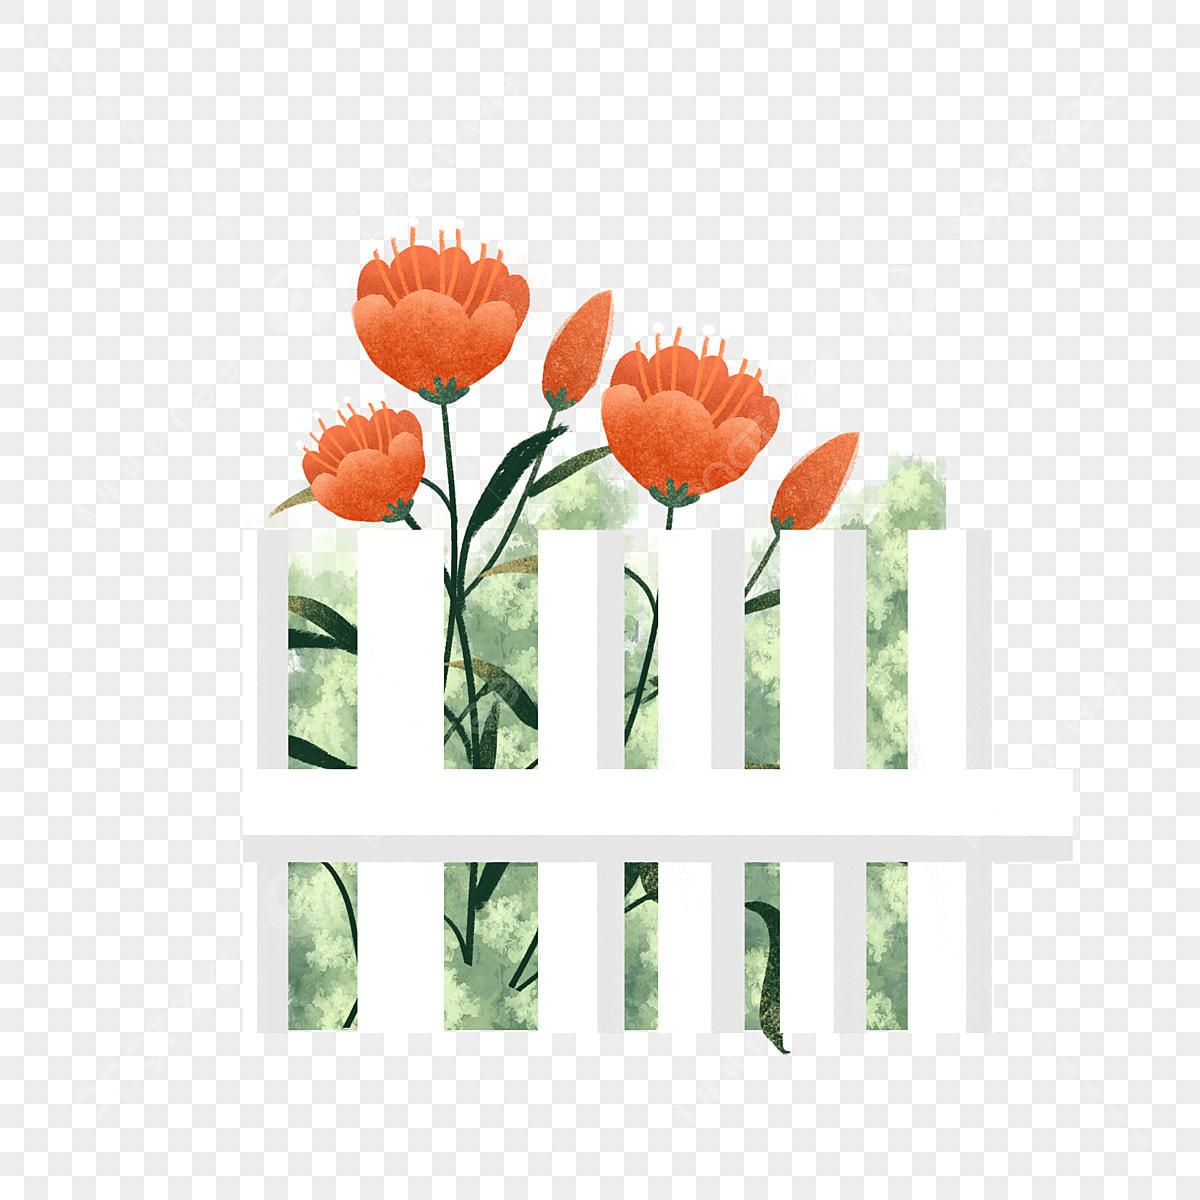 Flower Garden Gardening Clip Art - Bird - Picket Fence Clipart Transparent  PNG